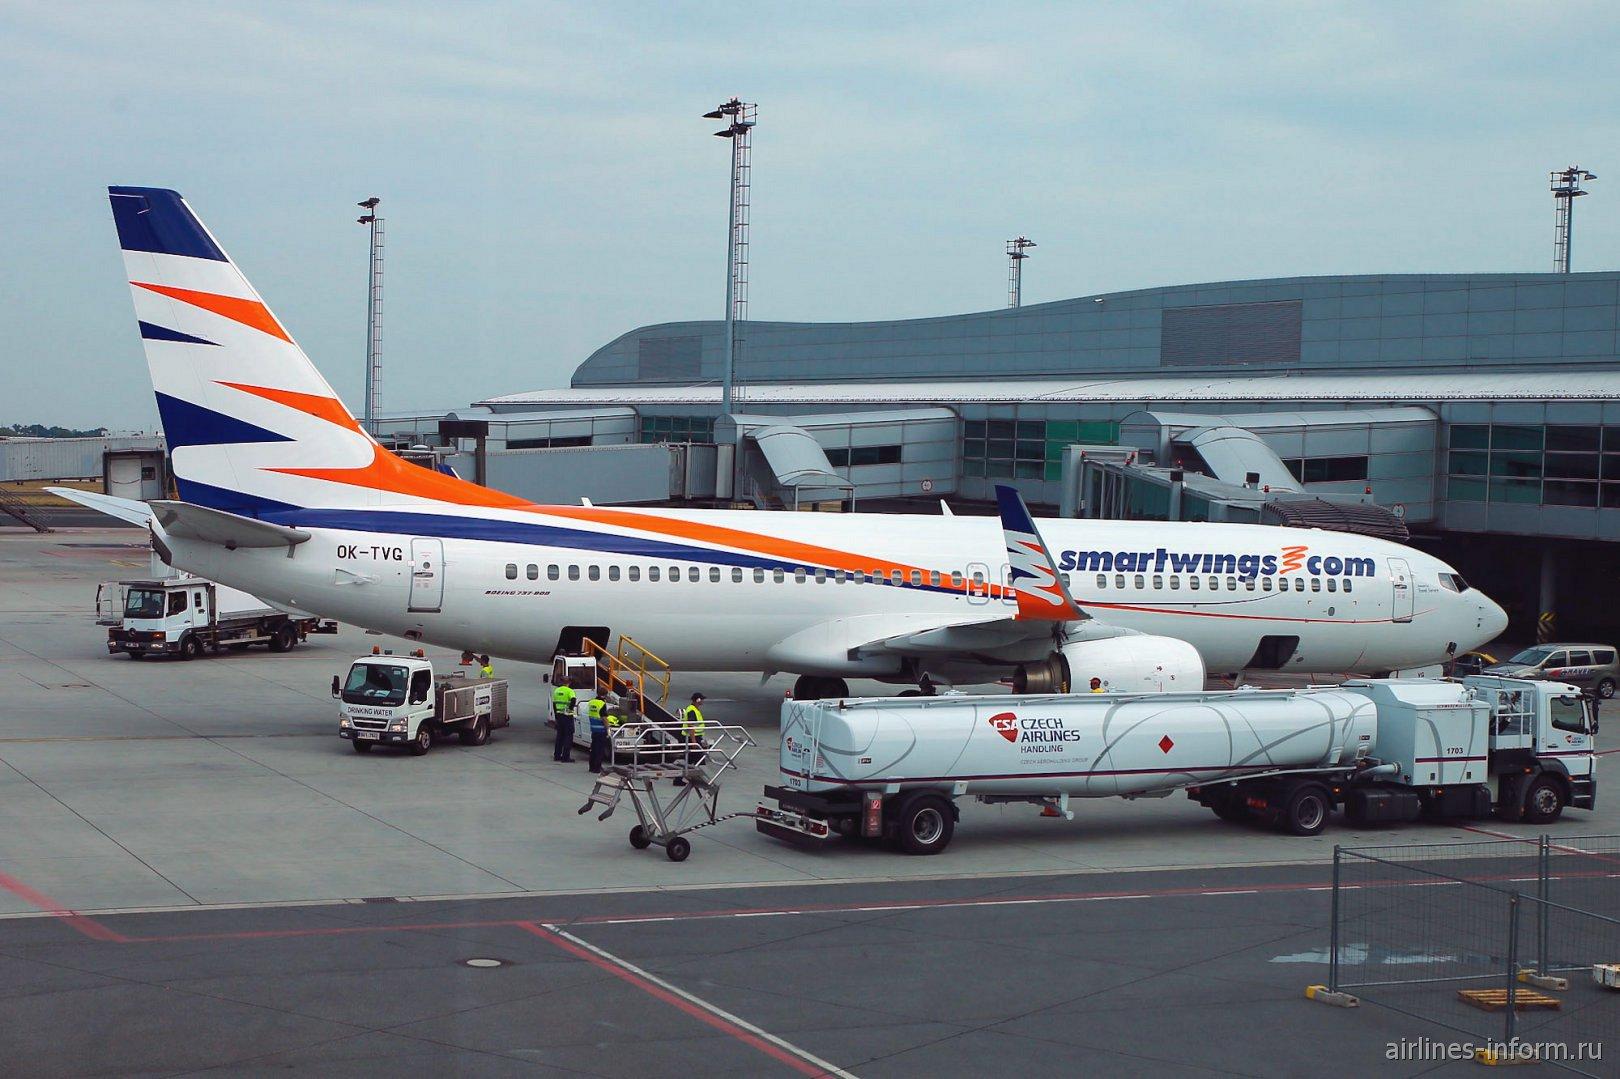 Авиалайнер Боинг-737-800 OK-TVG авиакомпании Smartwings в аэропорту Праги